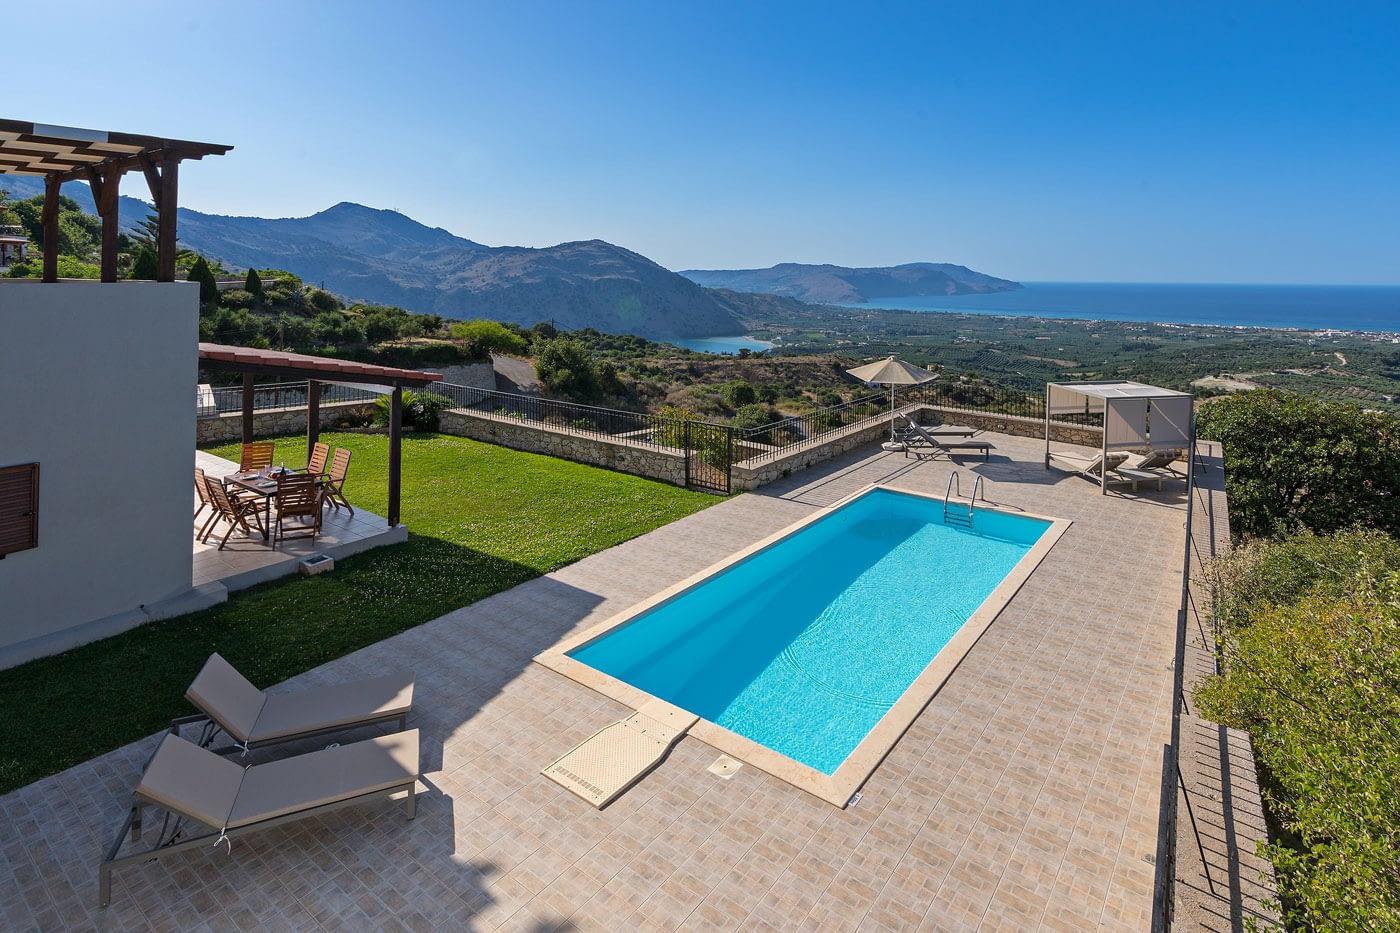 Pool View Crete